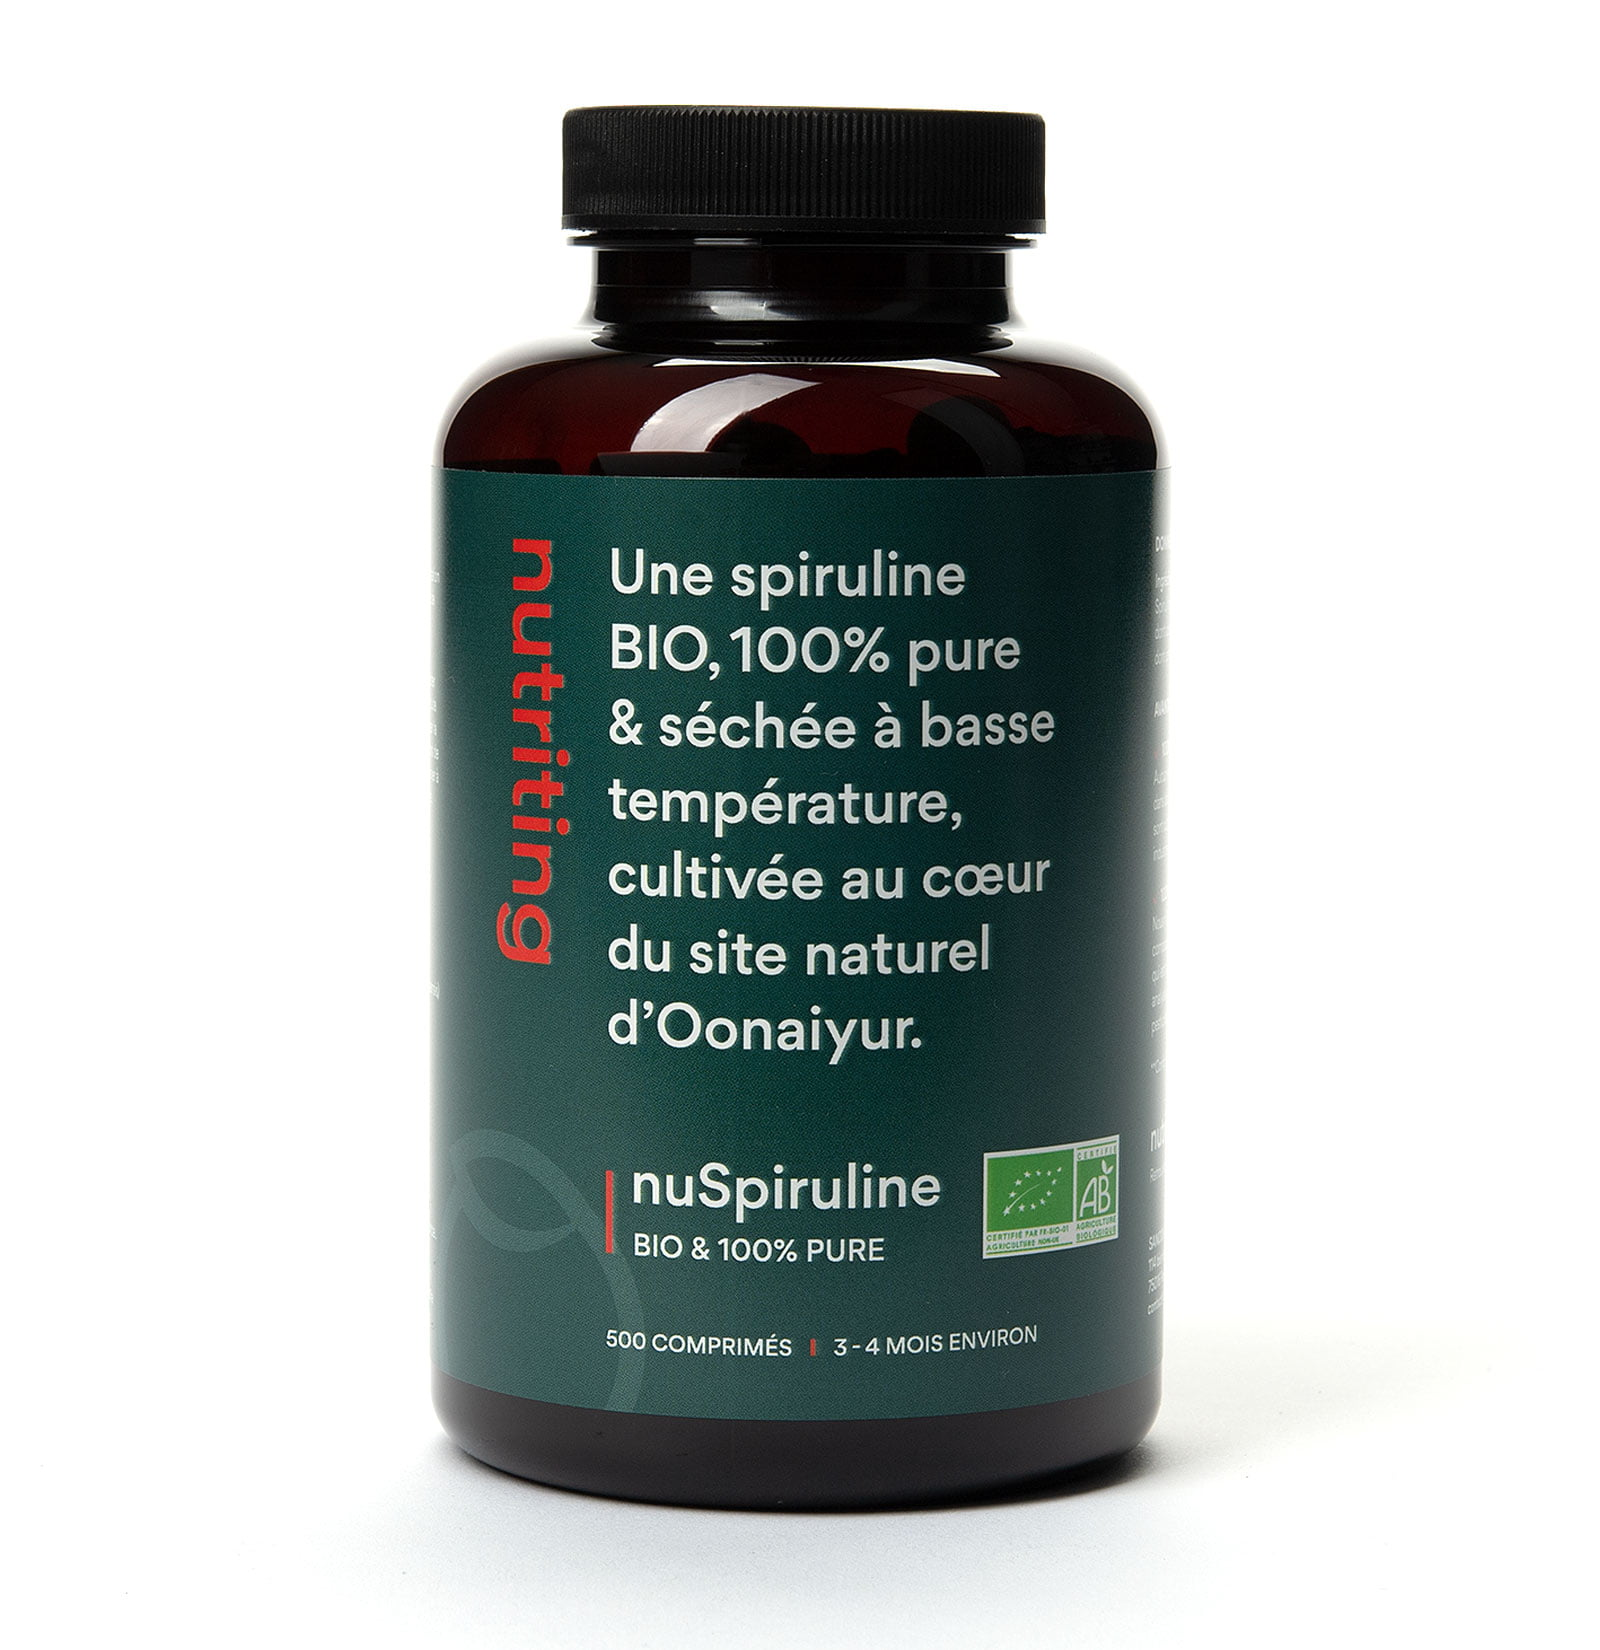 nuSpiruline